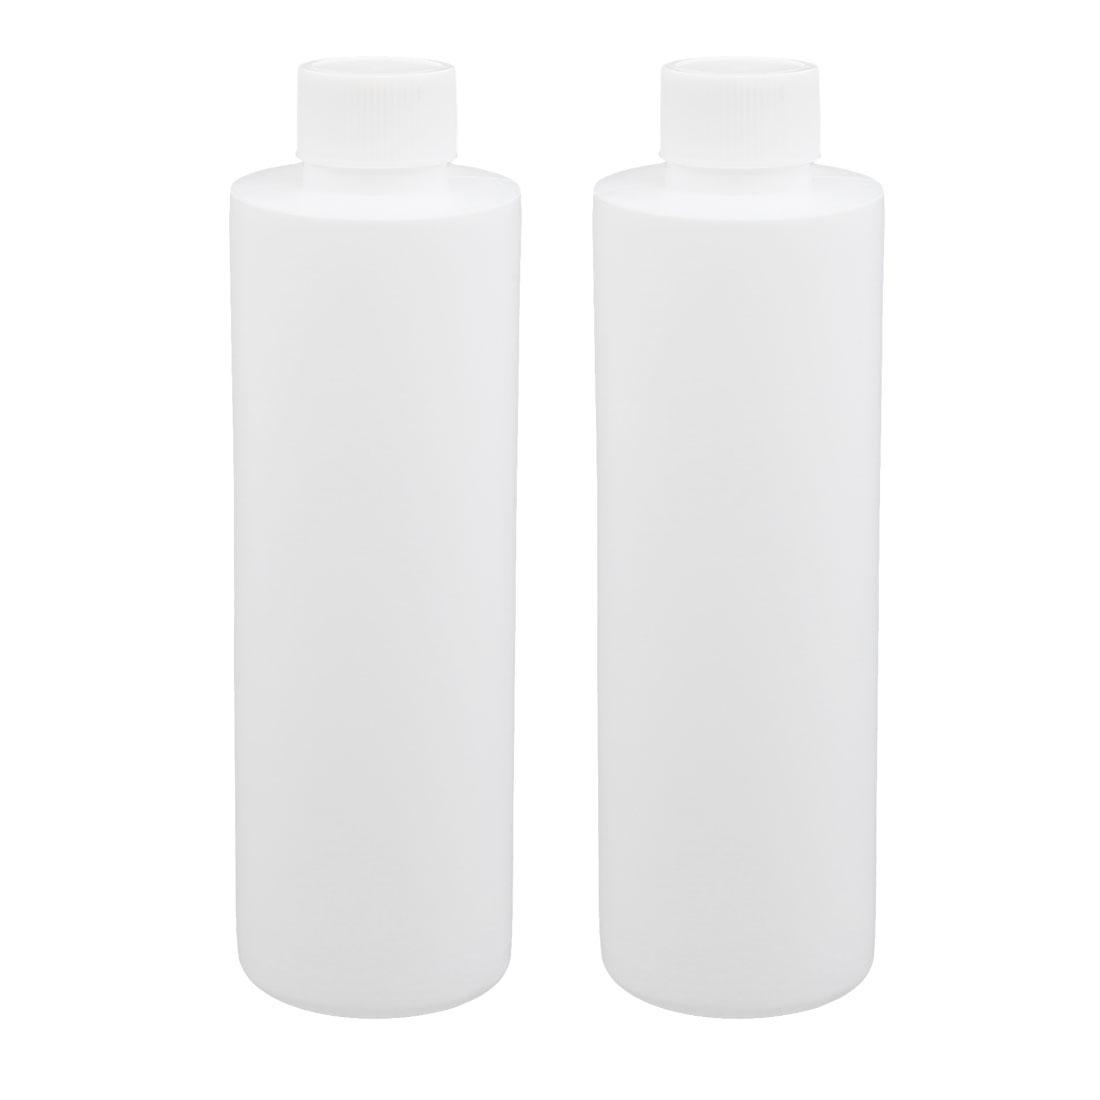 2pcs 17oz HDPE Plastic White Refillable Narrow Mouth Storage Bottle Jar DIY